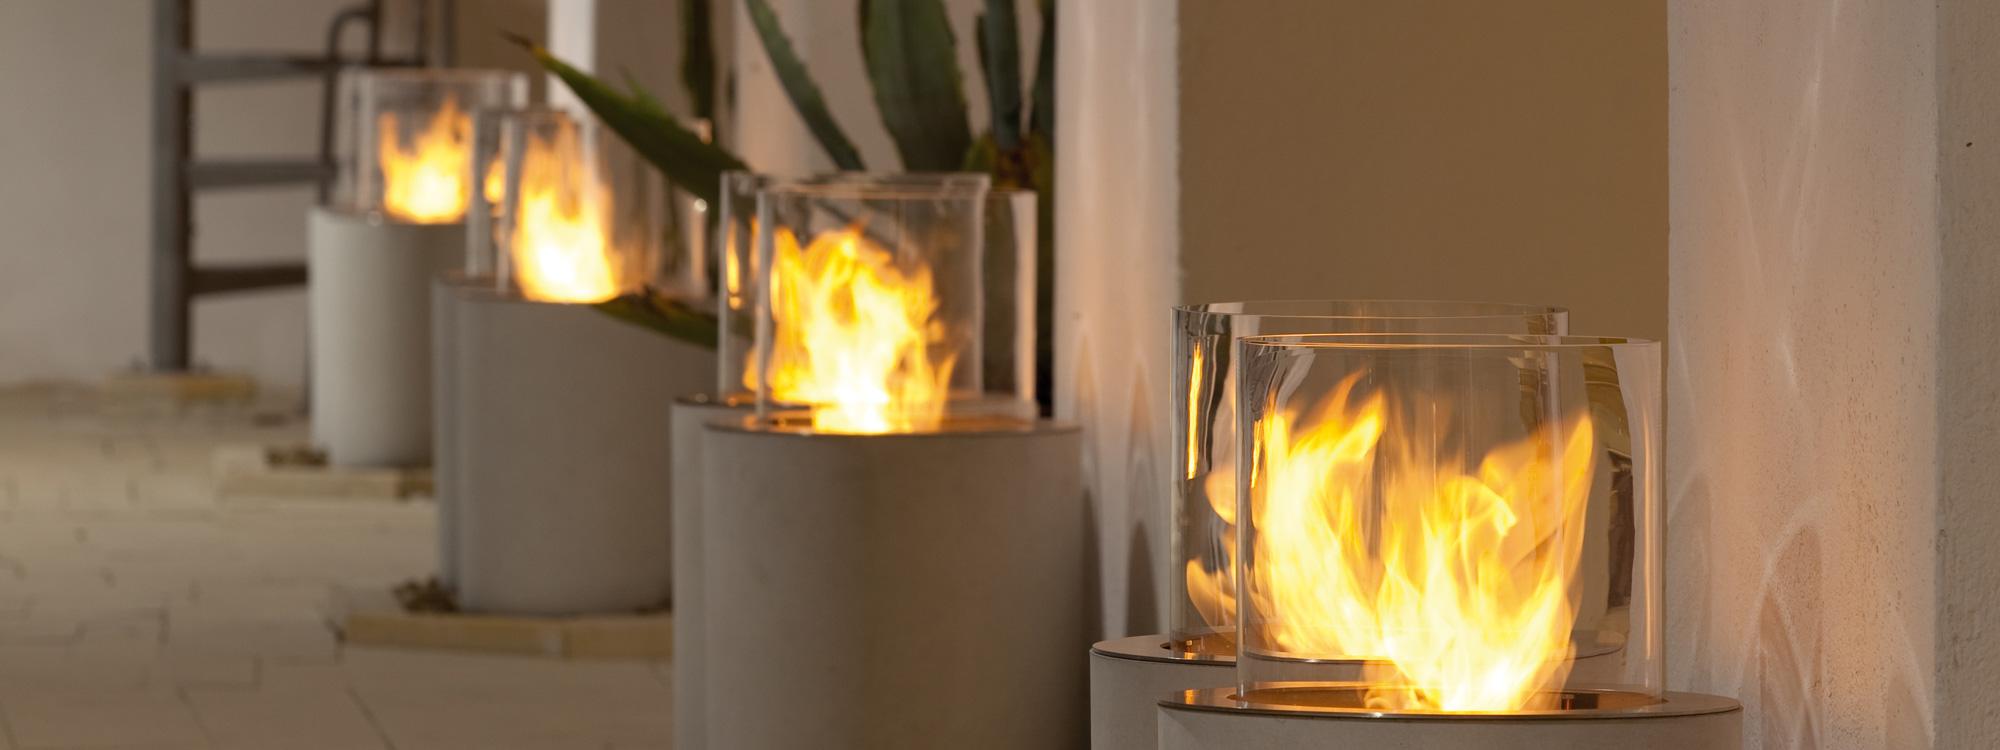 ethanol kamine innovative l sungen smart home ml kaminofen duisburg. Black Bedroom Furniture Sets. Home Design Ideas